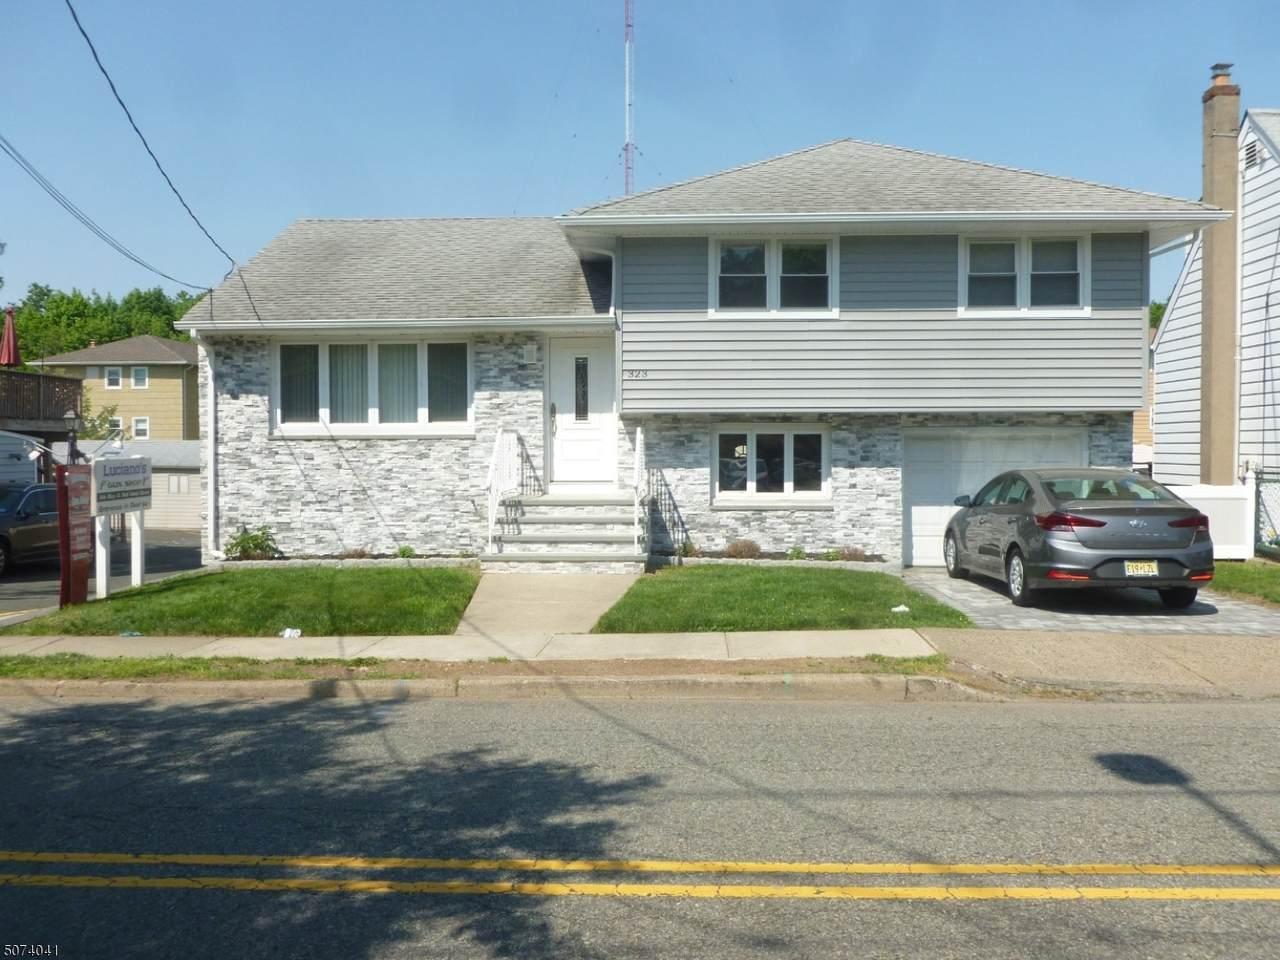 323 Garibaldi Ave - Photo 1